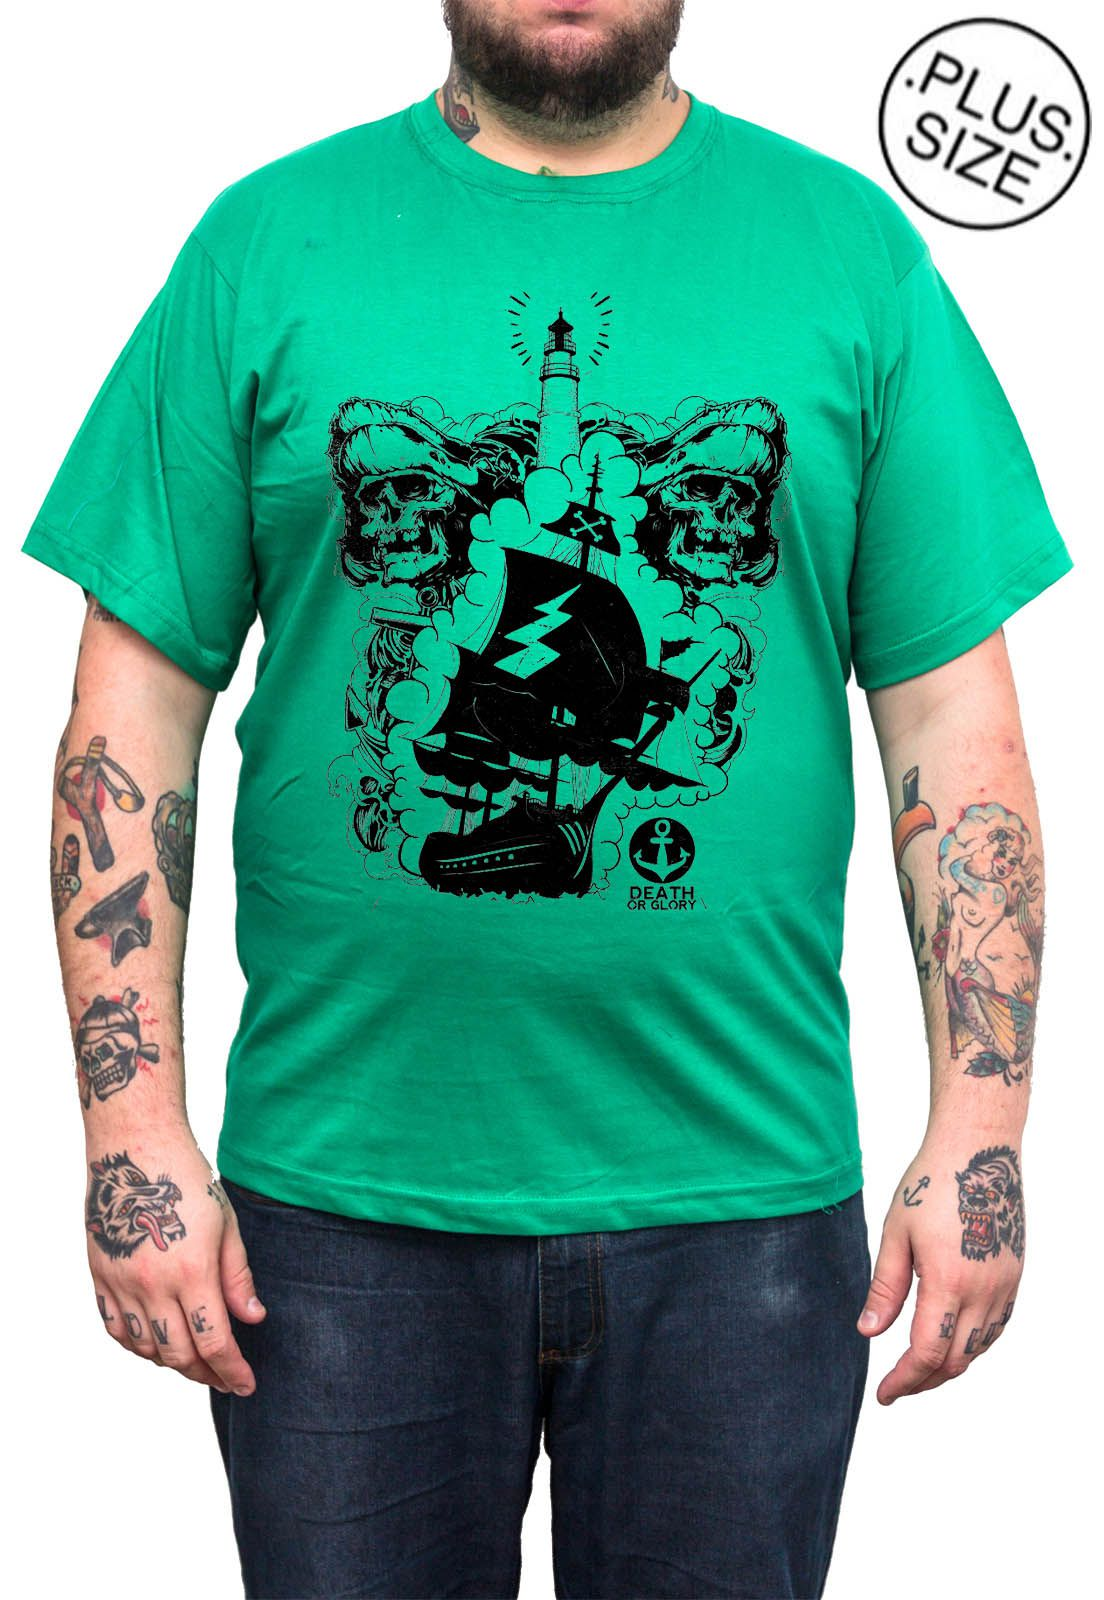 Camiseta Hshop Pirata - Verde Bandeira - Plus Size - Tamanho Grande XG  - HShop